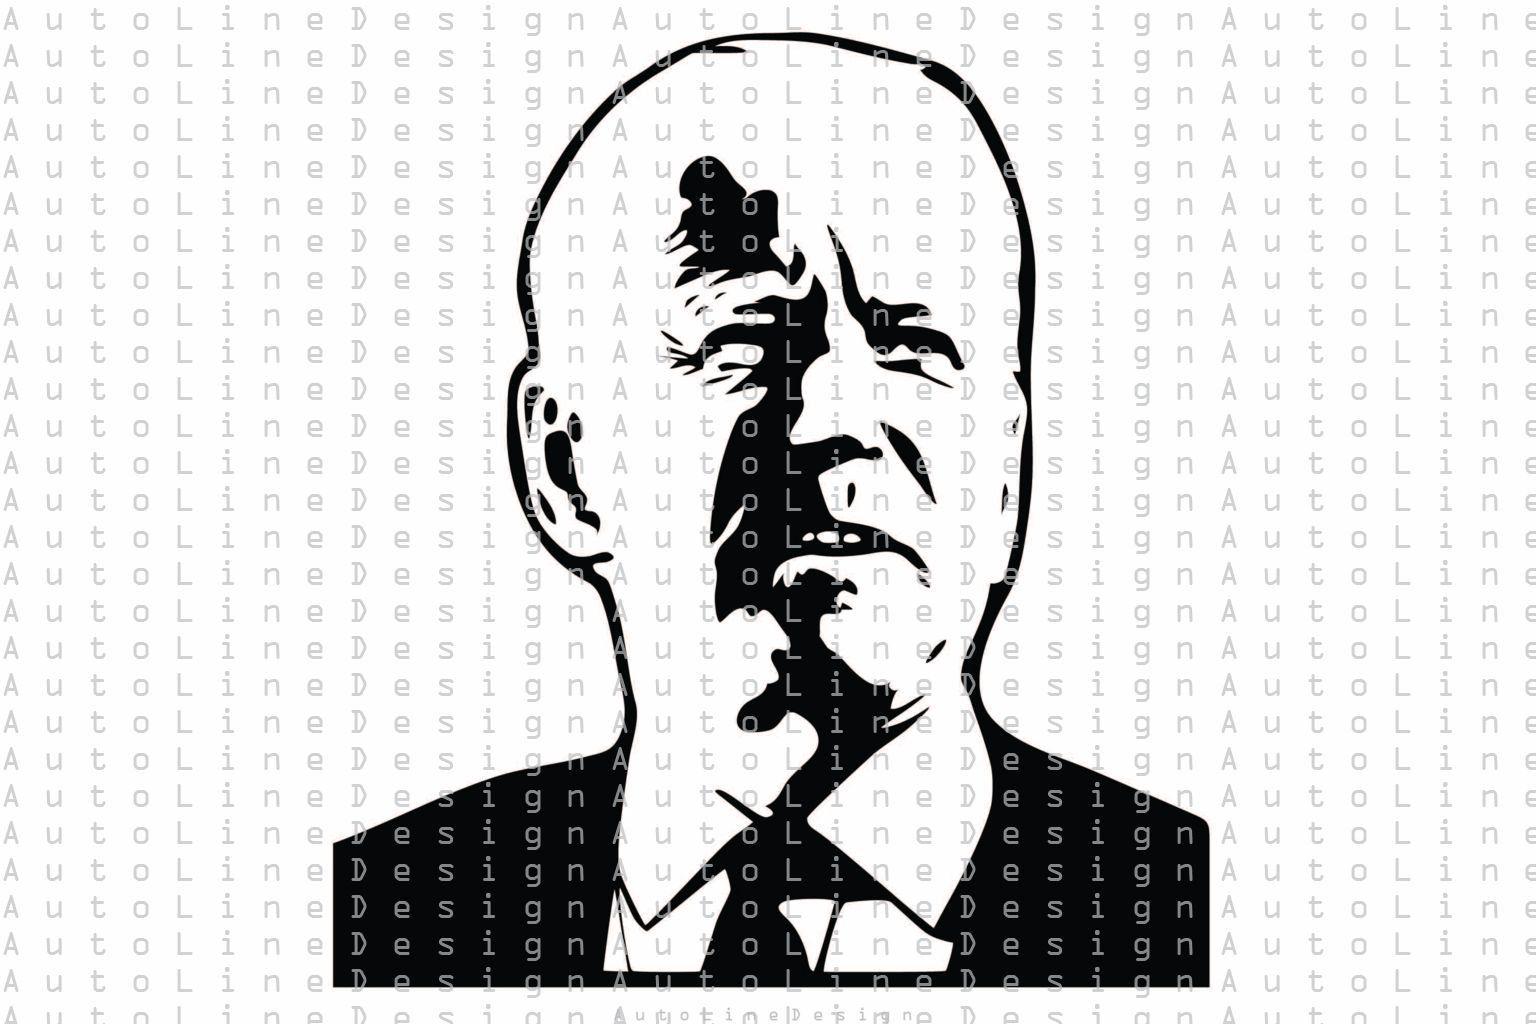 Joe Biden Portrait Svg Pdf Dxf Png Eps Illustration Vector Stencil Graphic Art Instant Download In 2021 Graphic Art Stencils Illustration